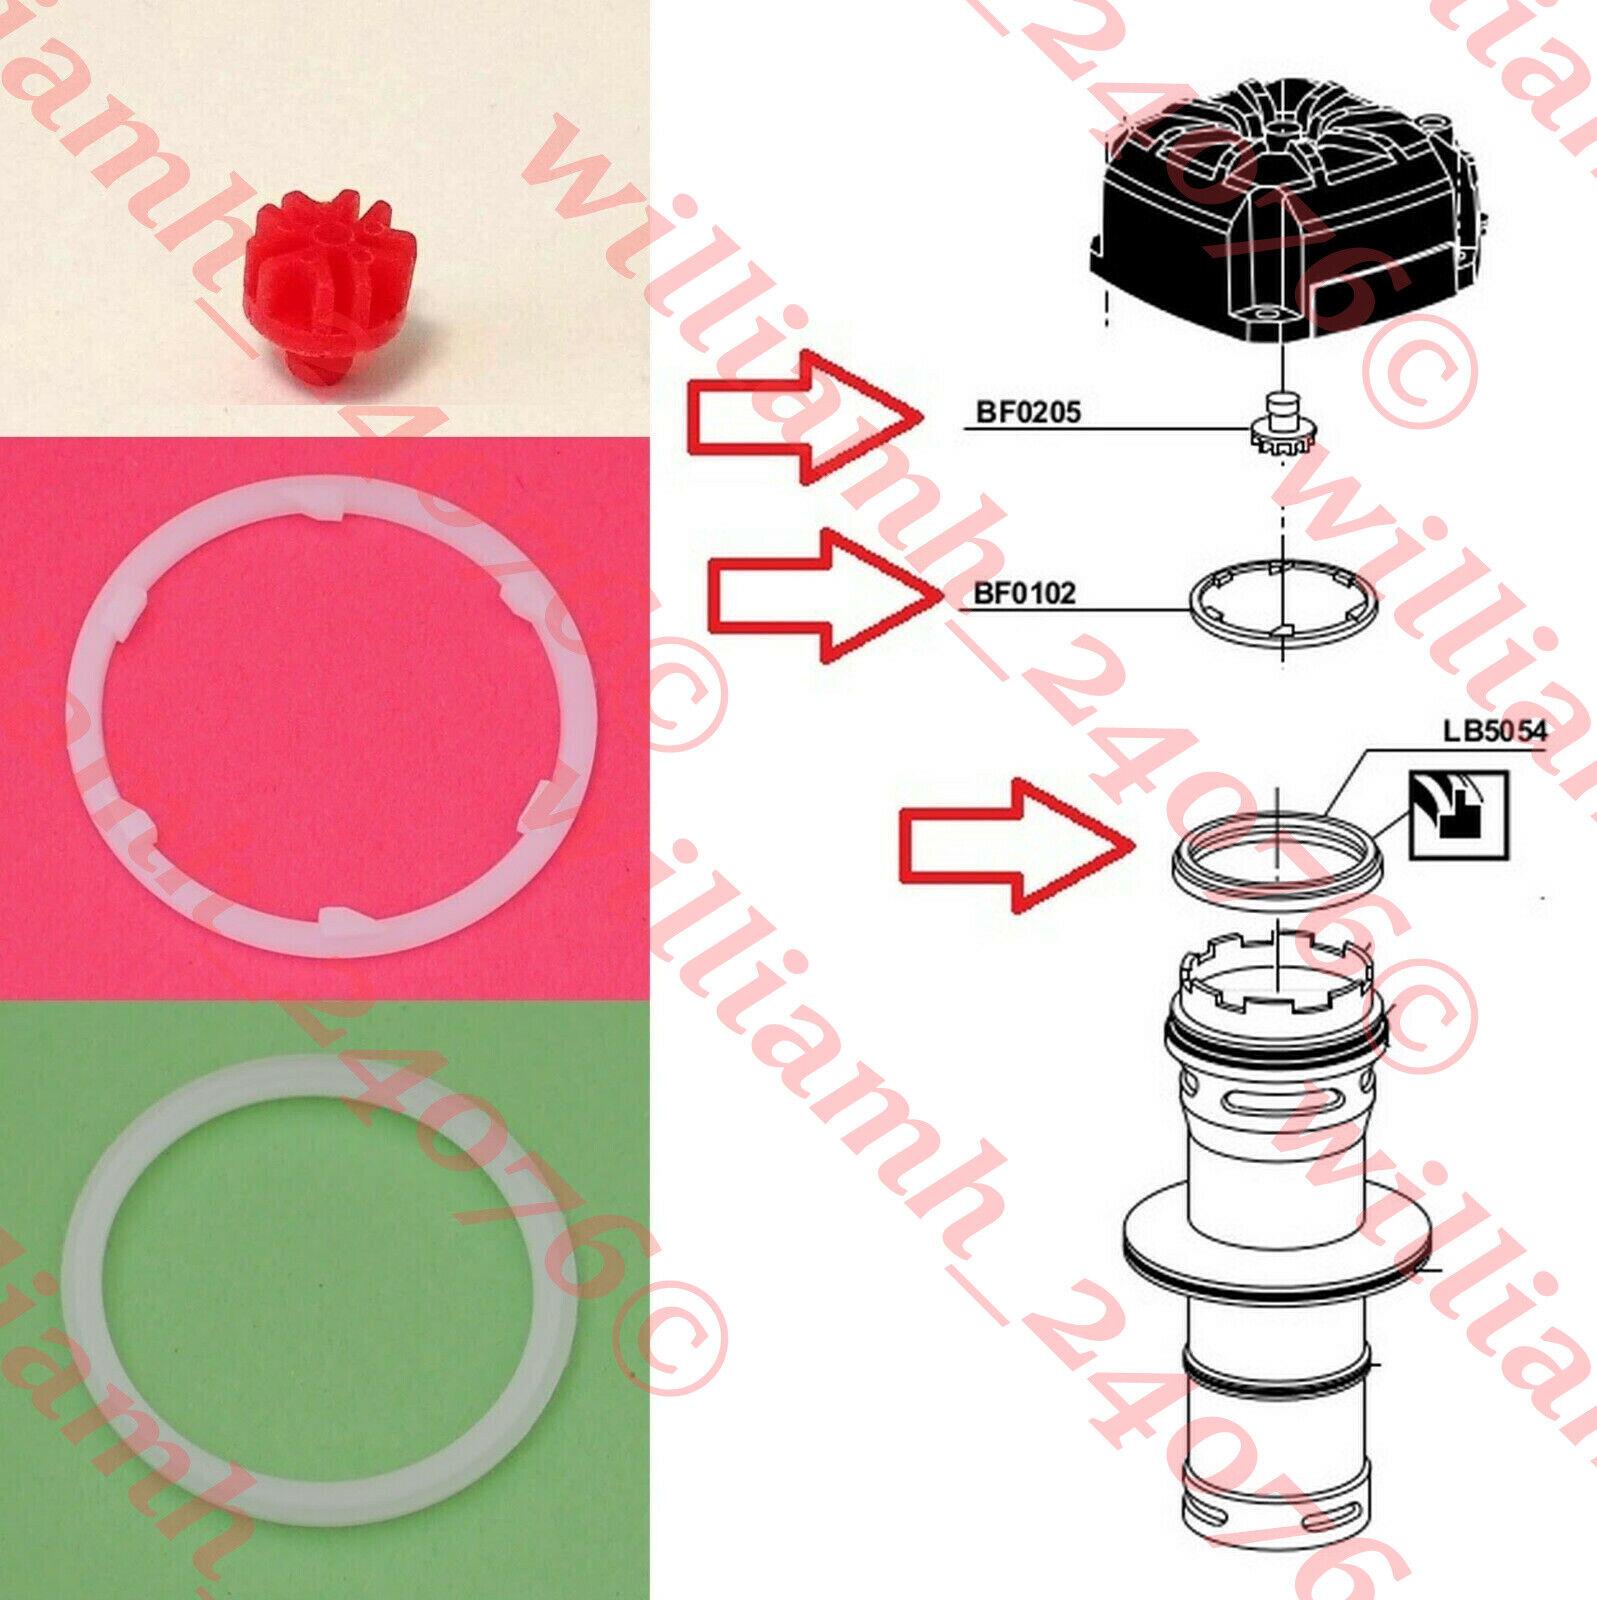 Senco Framing Nailer SN60 SN65 parts BF0102 + LB5054 + BF020